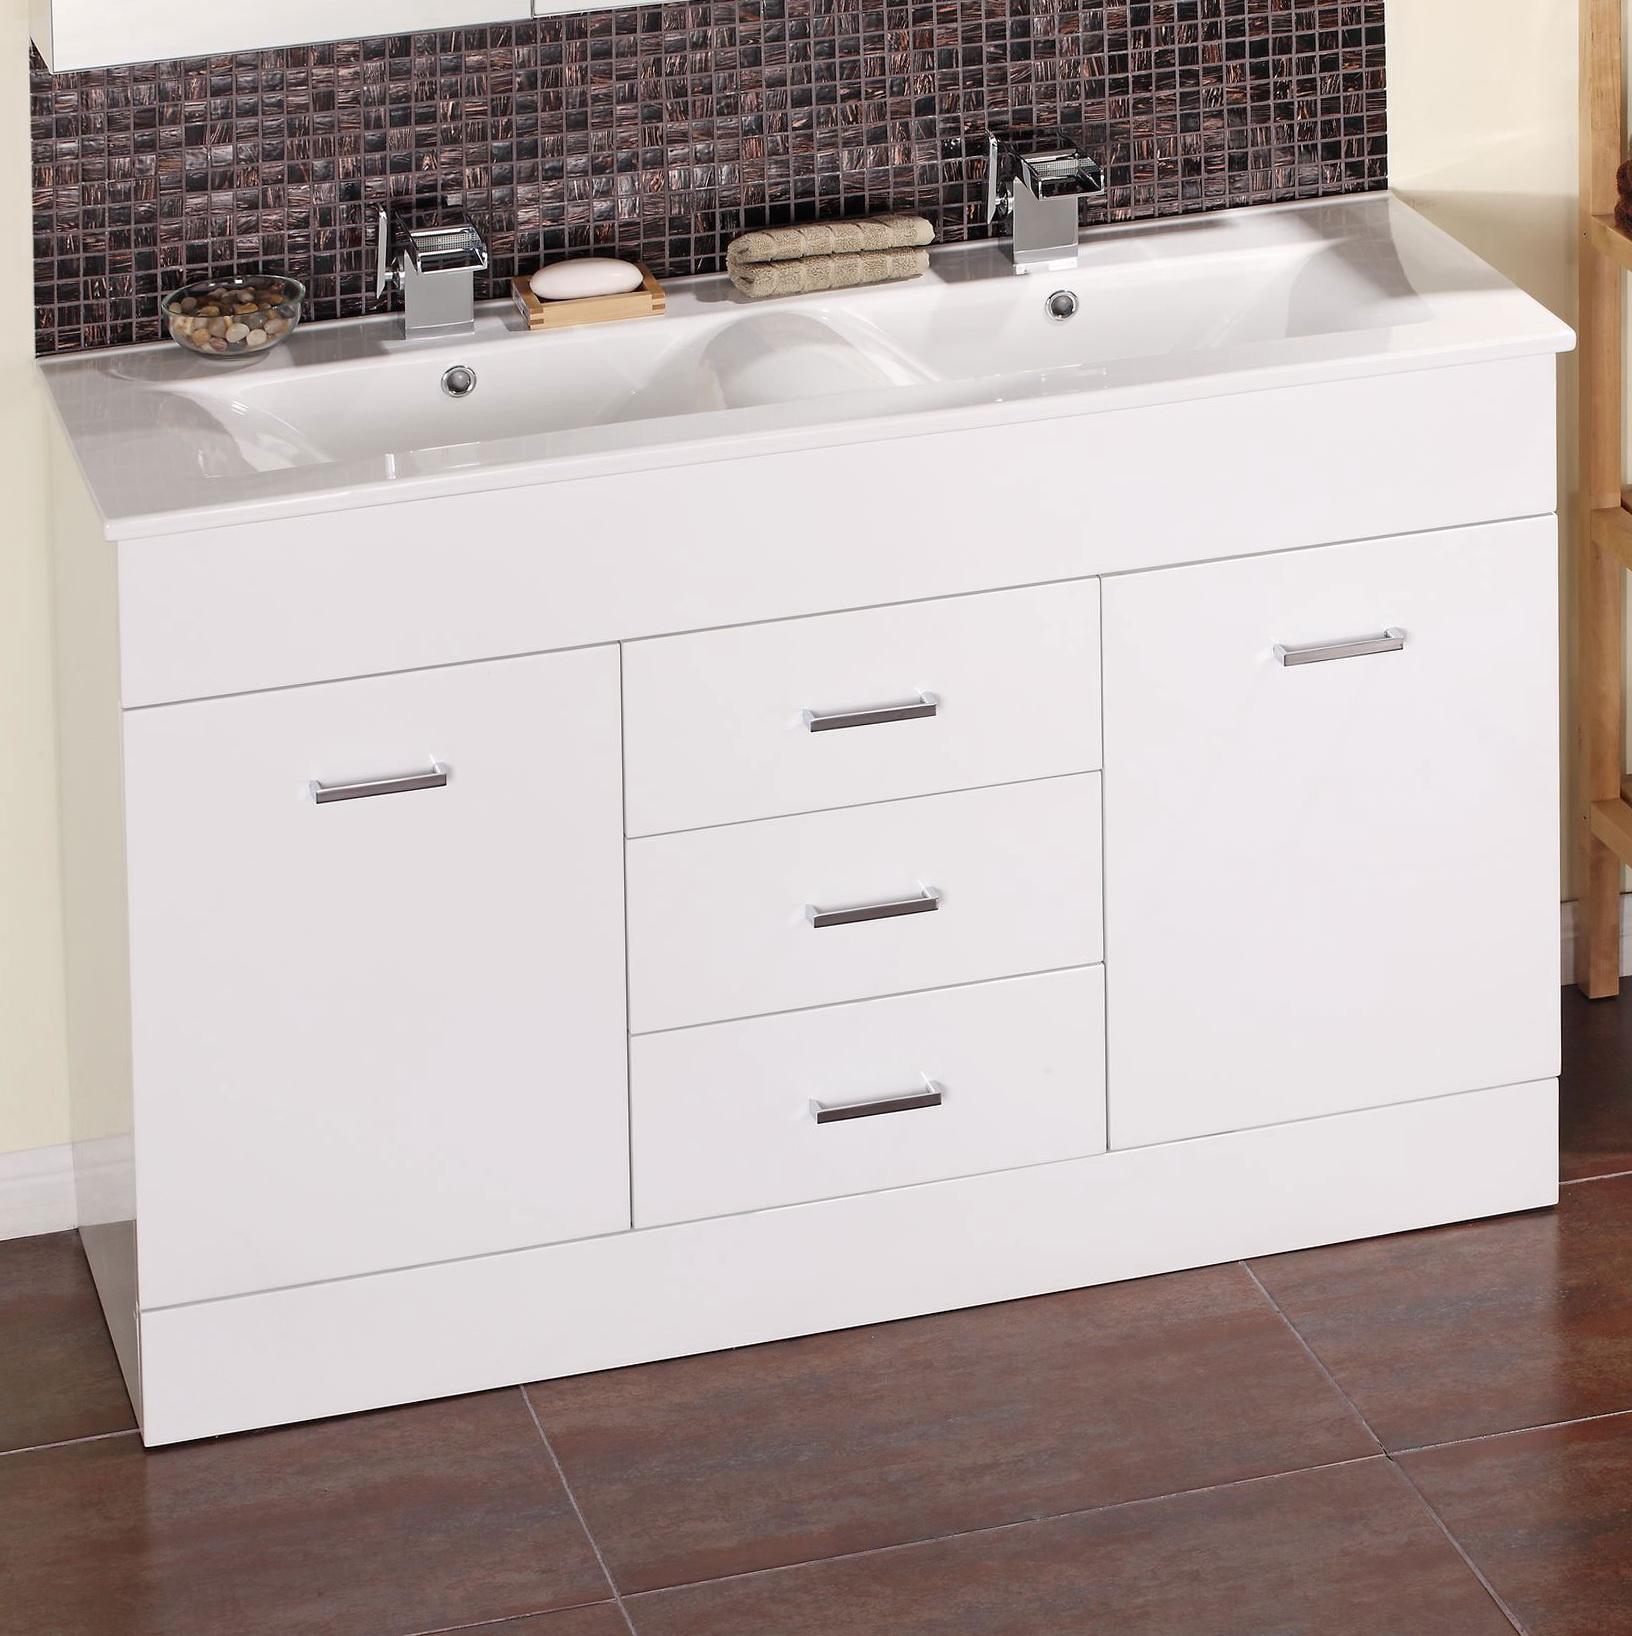 Bathroom Double Sink Vanity Units Home Design Ideas